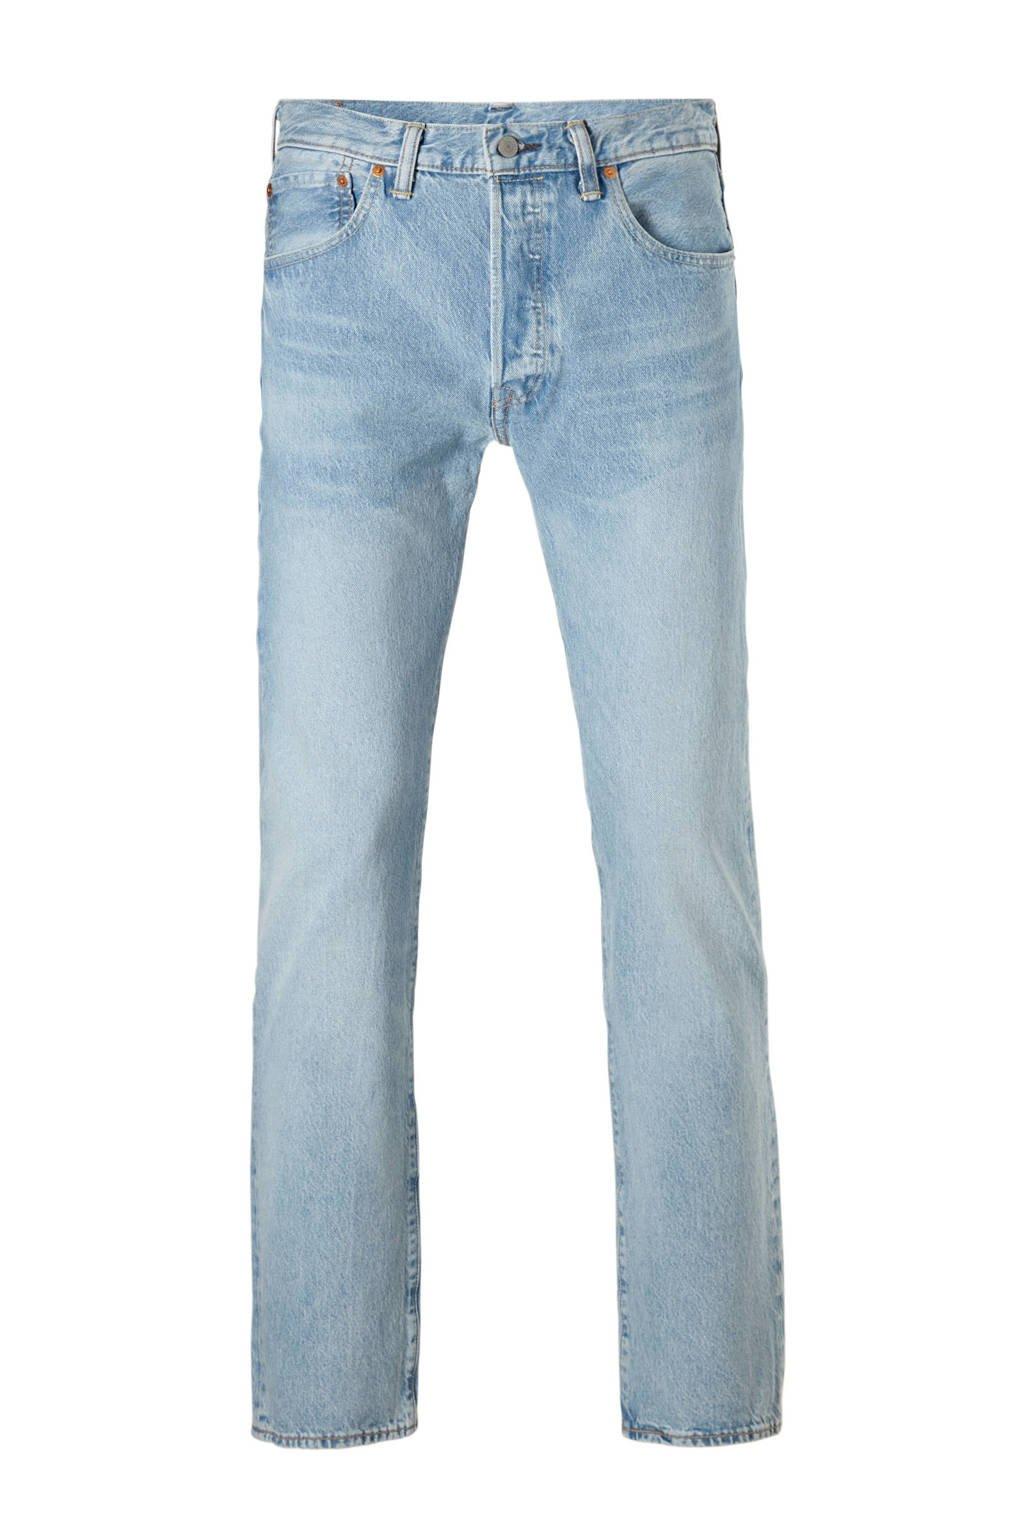 Levi's regular fit jeans 489 Original, Mowhawk Warp Str